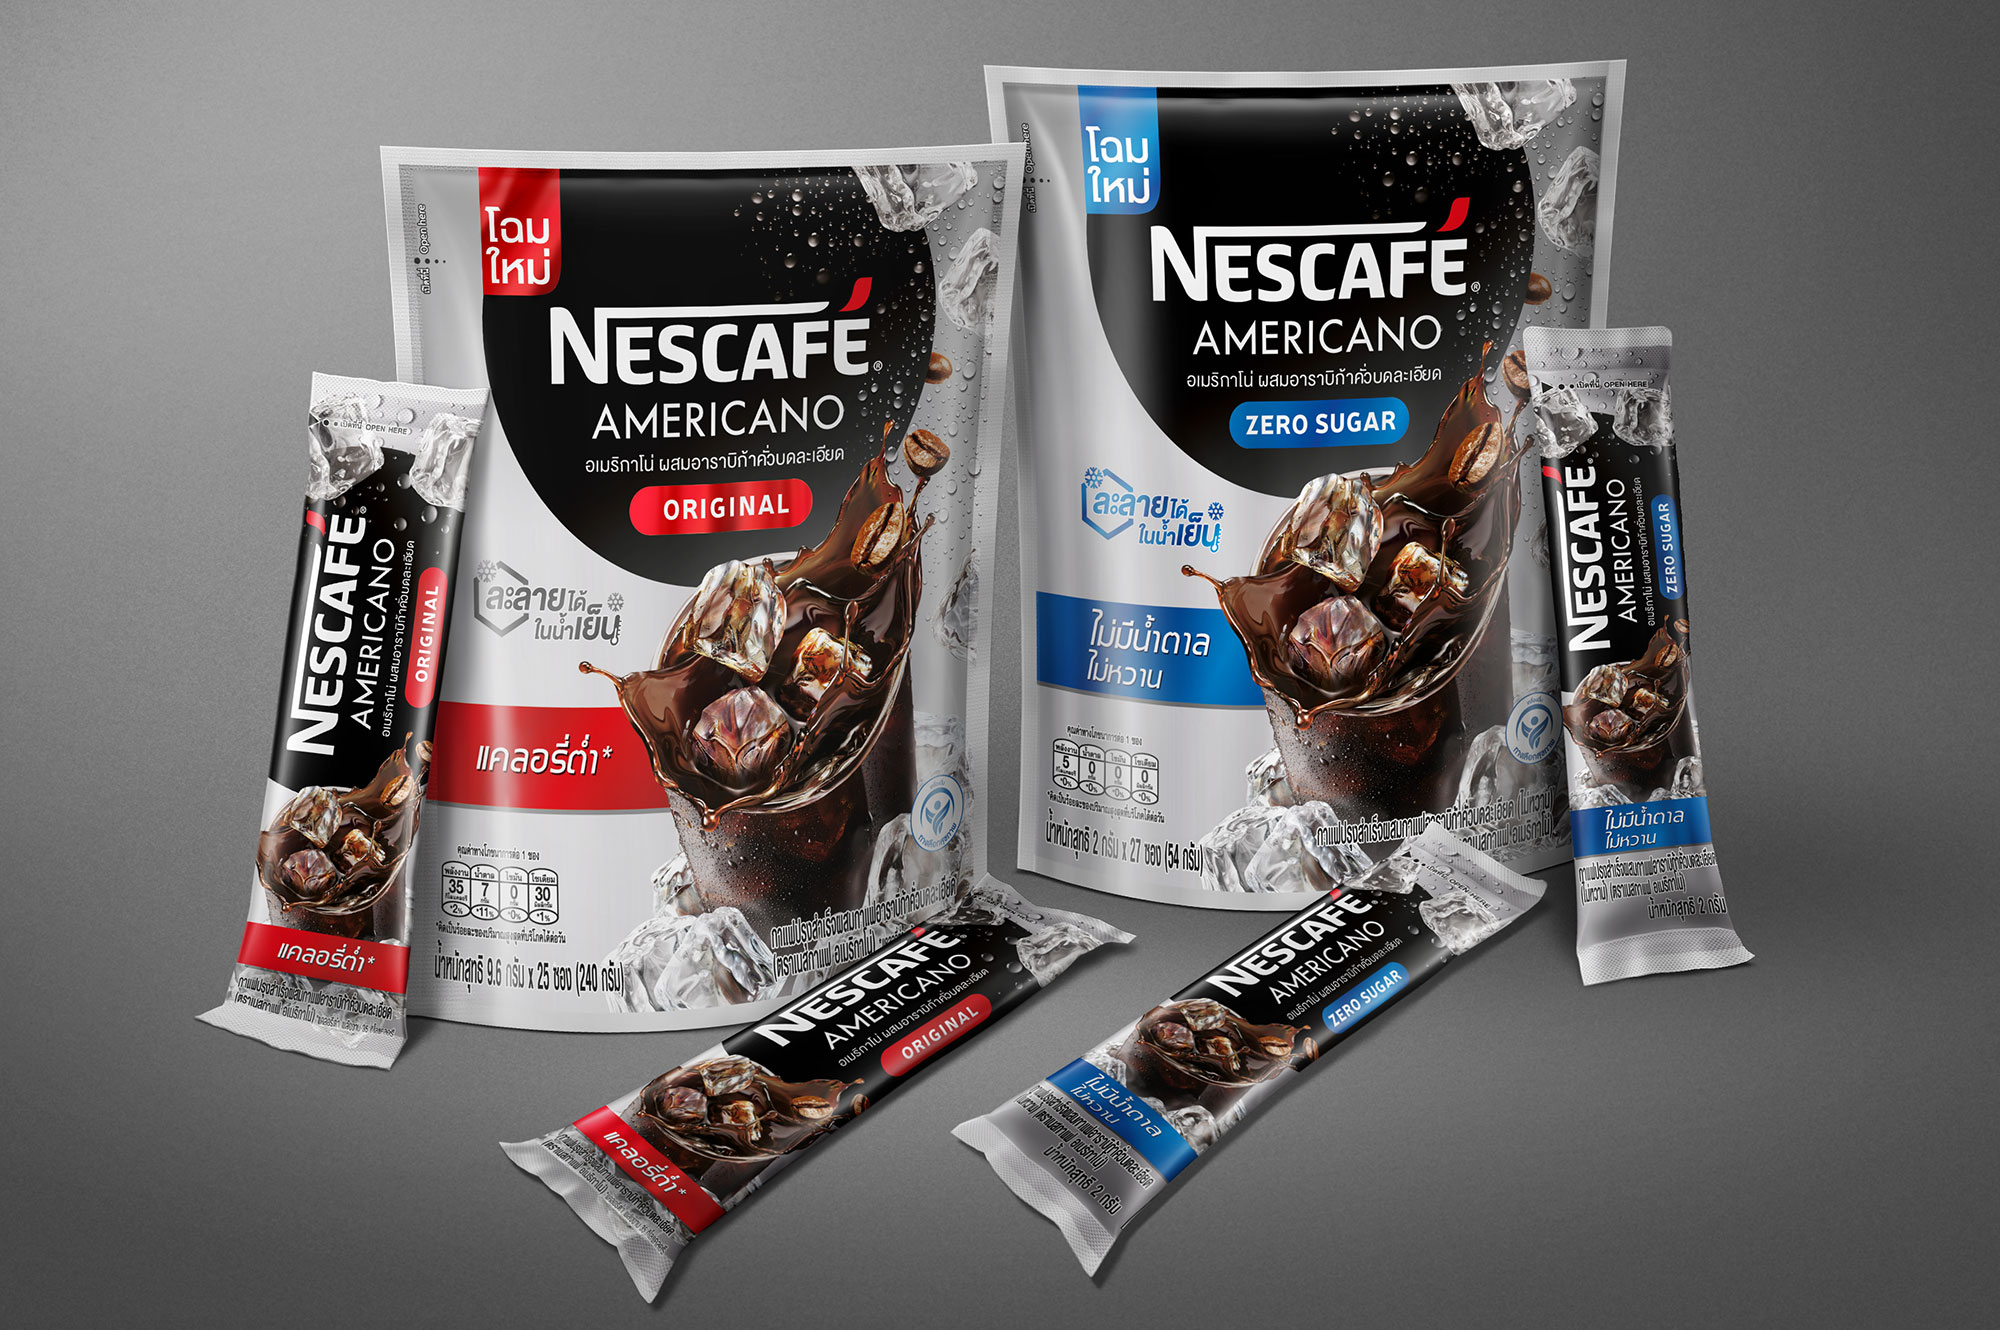 Nescafe Americano Packaging Design